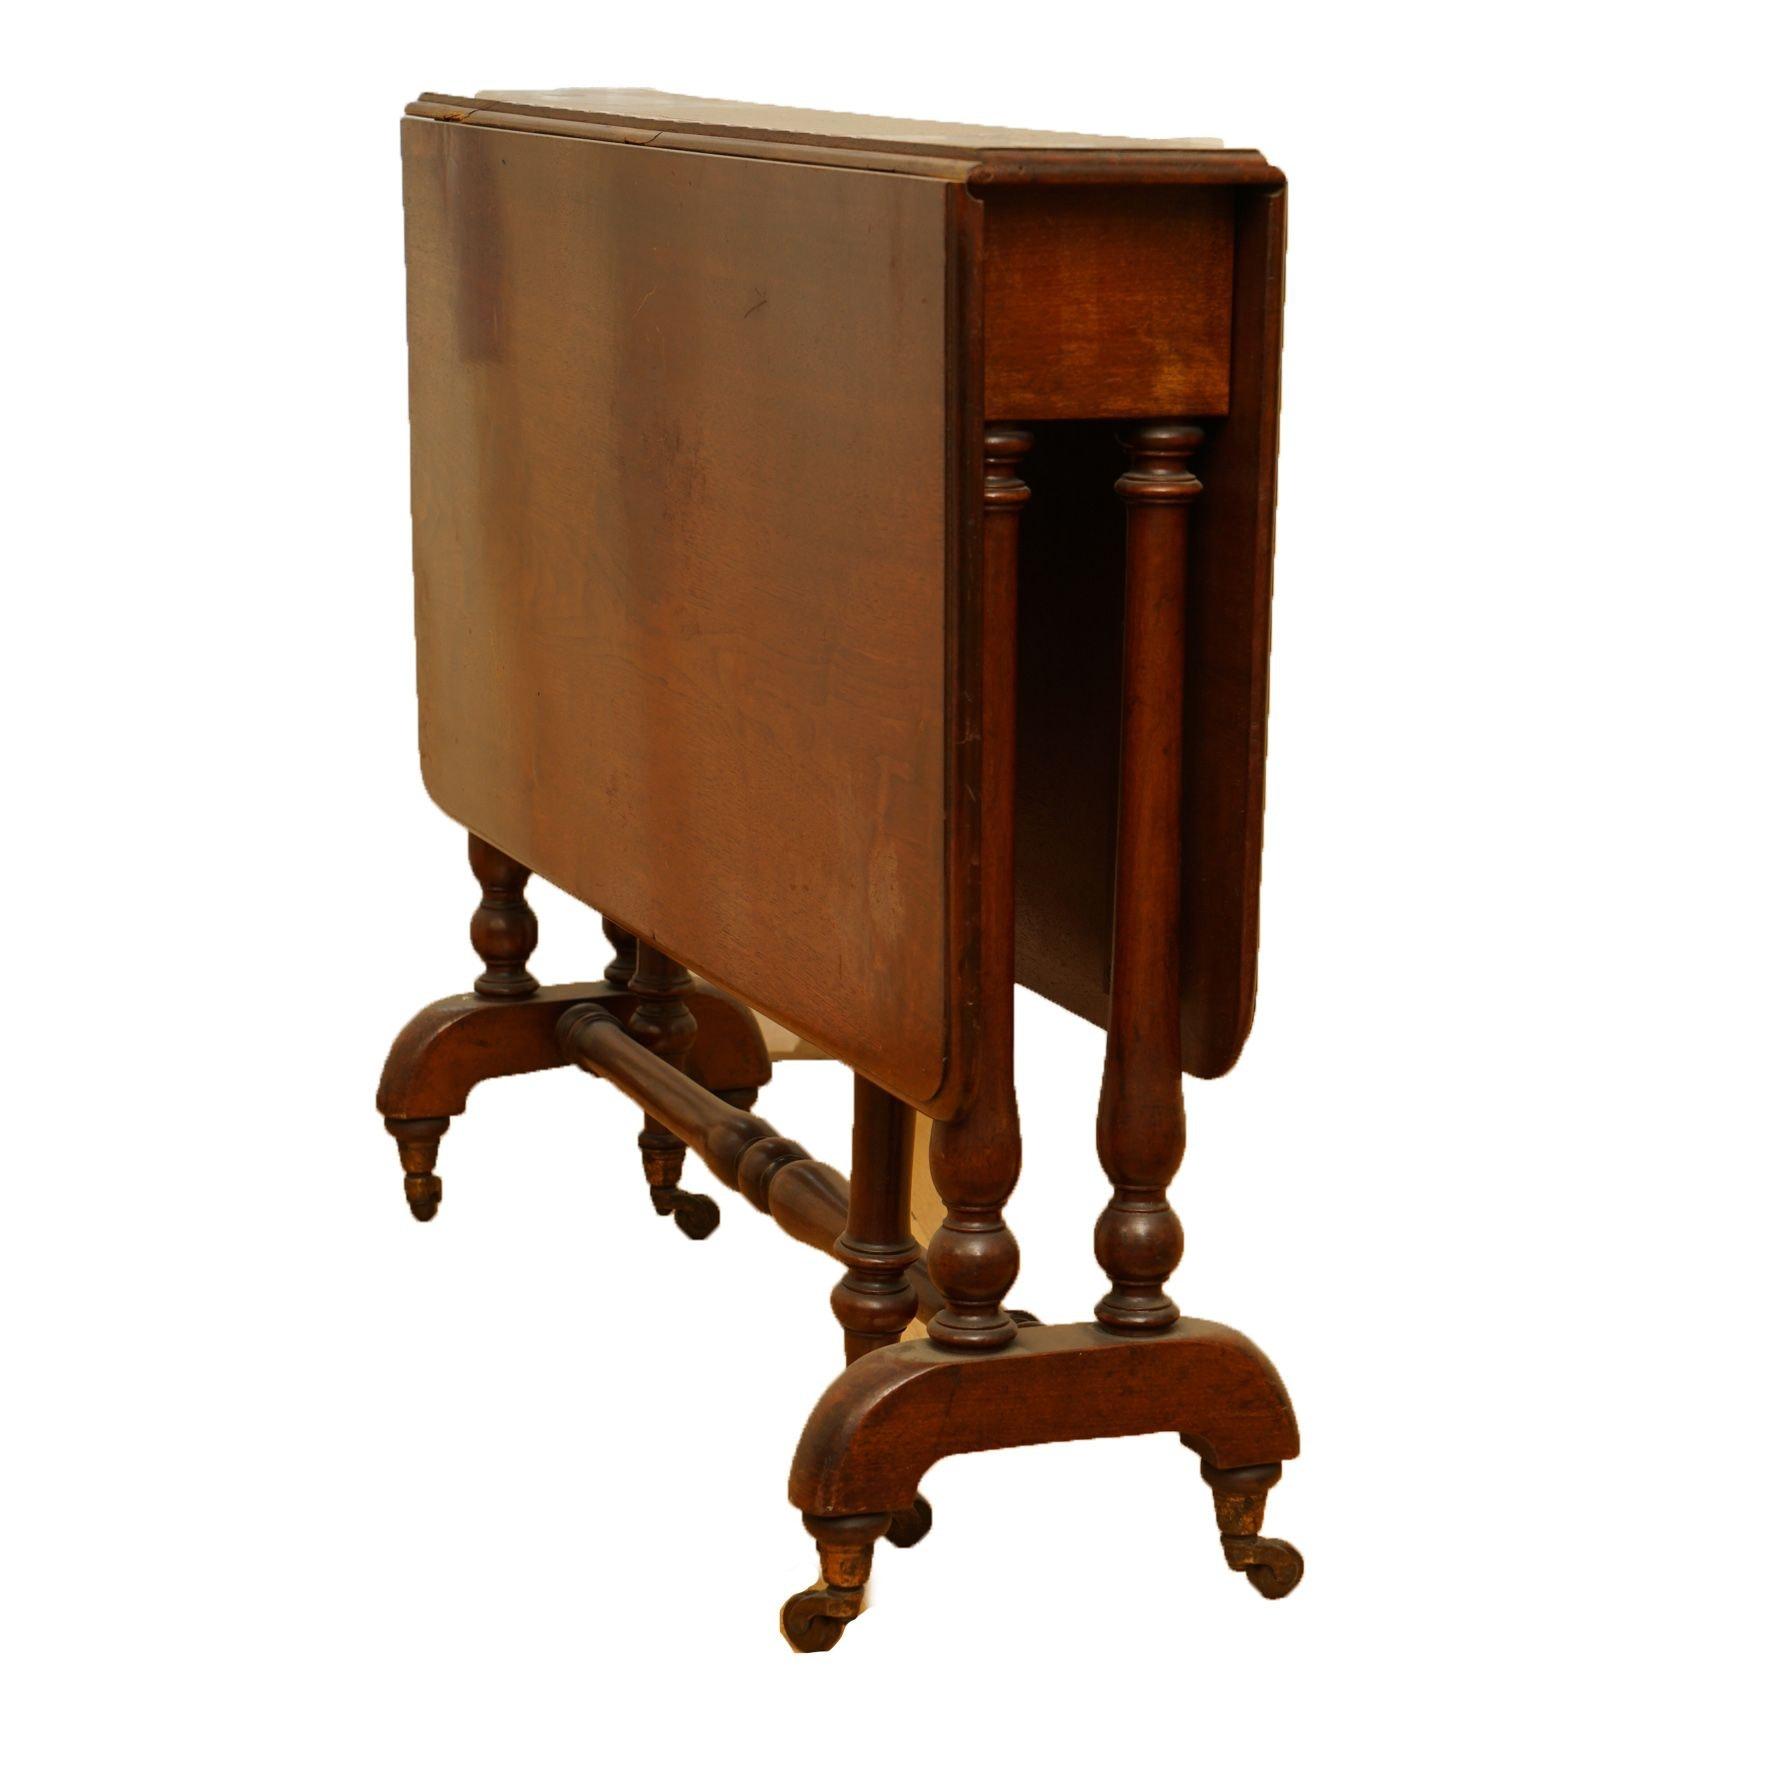 Vintage Mahogany Drop Leaf Gate Leg Table